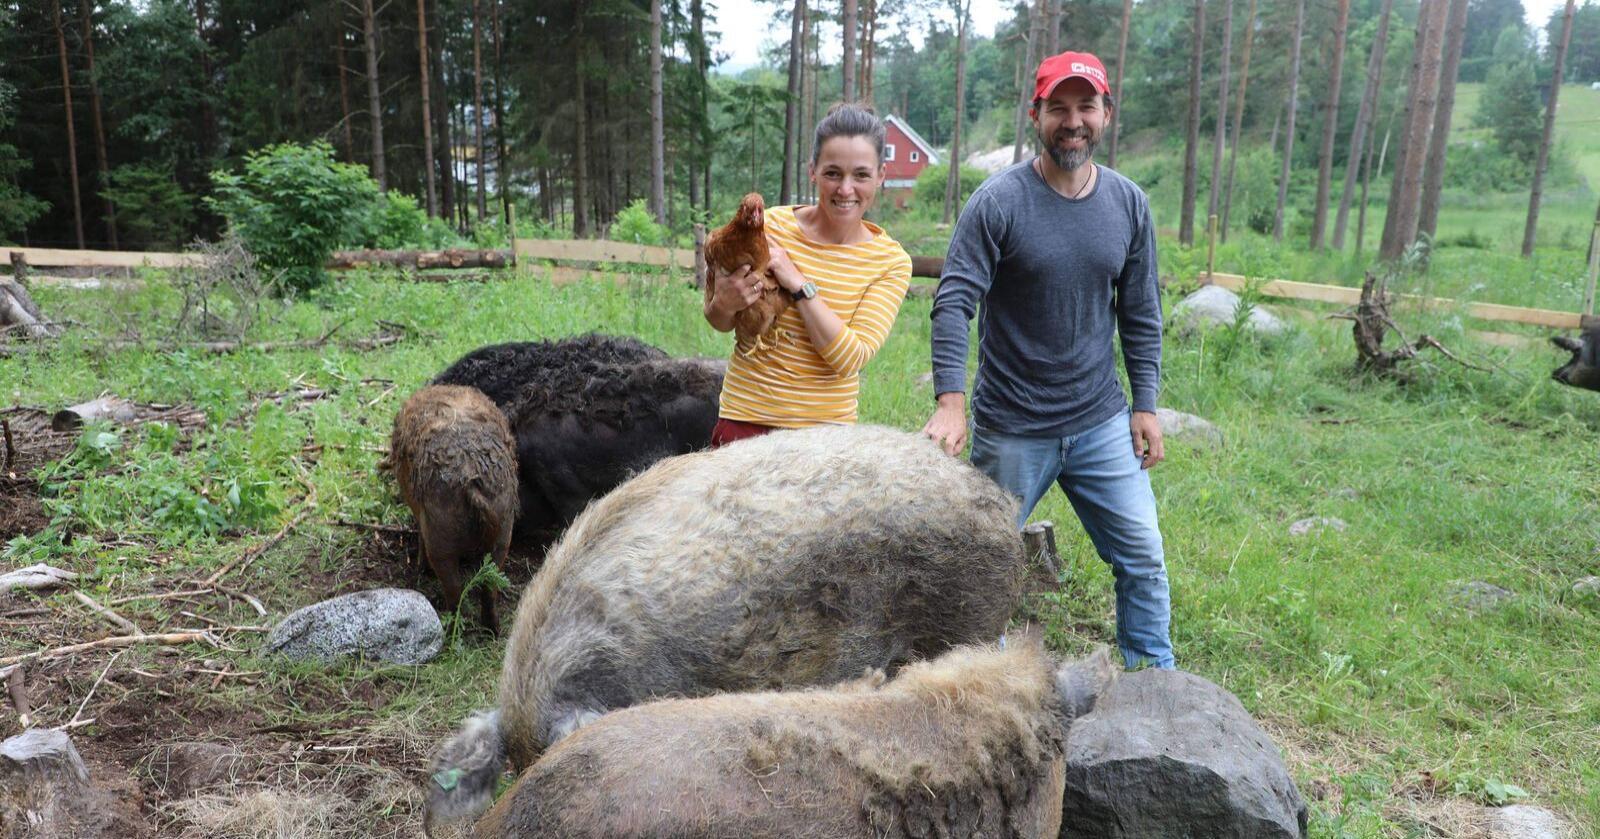 På dette bildet er Johannes Solberg (t.h) og hans kollega Camilla Lester-Watvedt (t.v.) Foto: Sophie Sætern